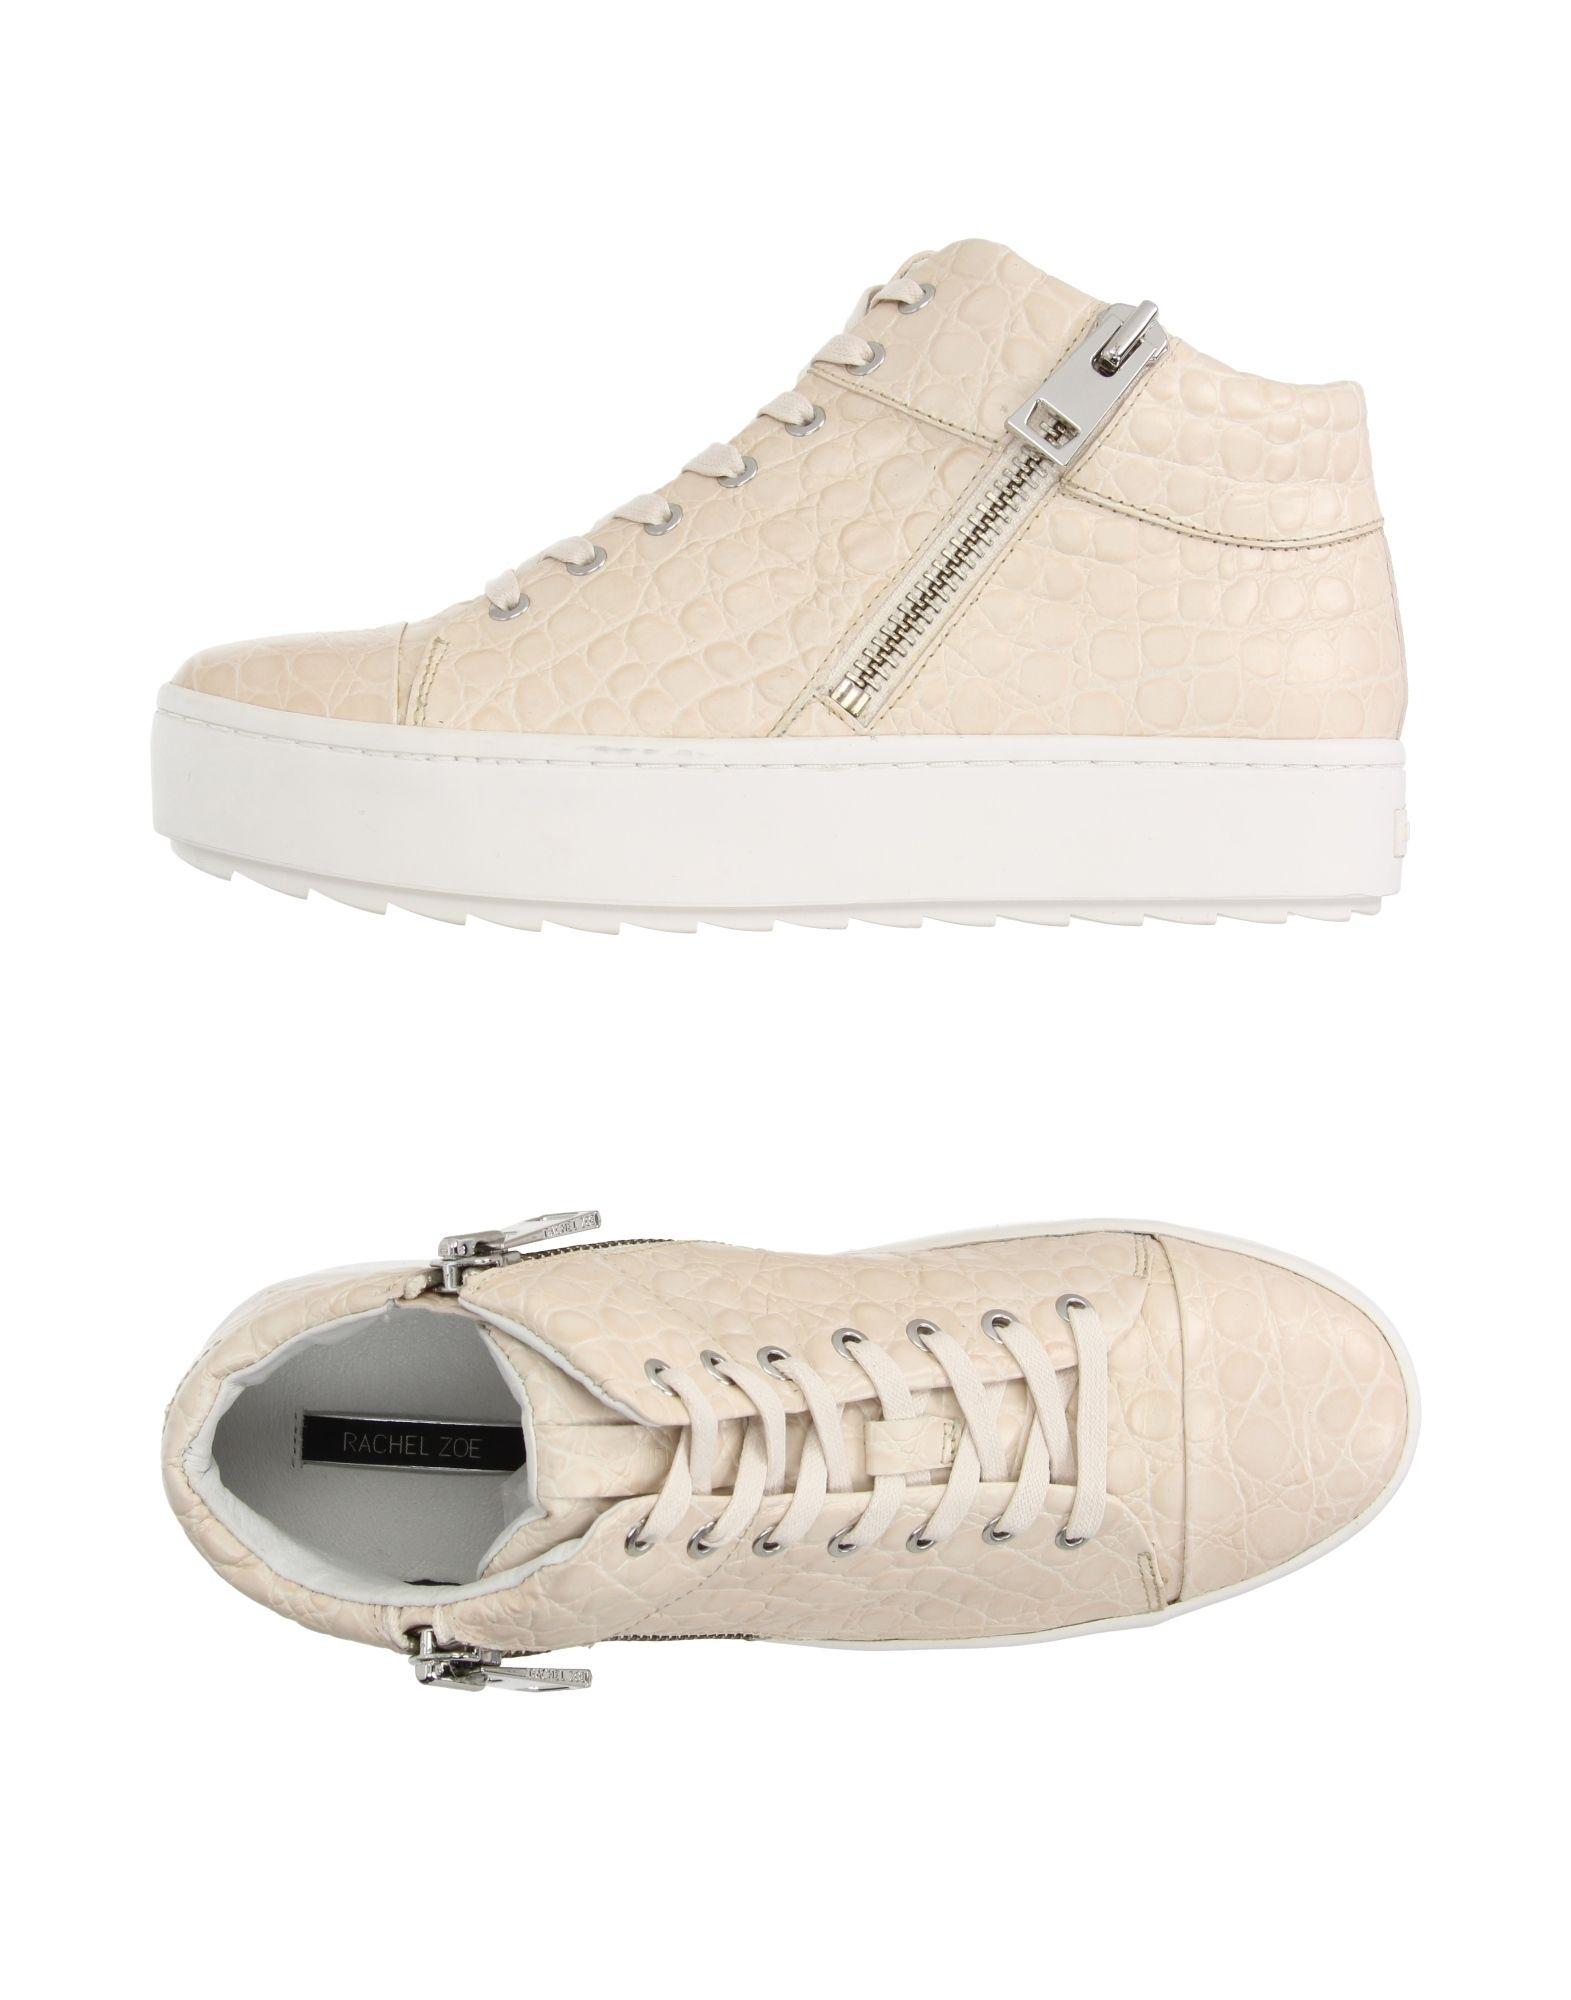 Rachel Zoe Sneakers Damen  11193741FE Gute Qualität beliebte Schuhe